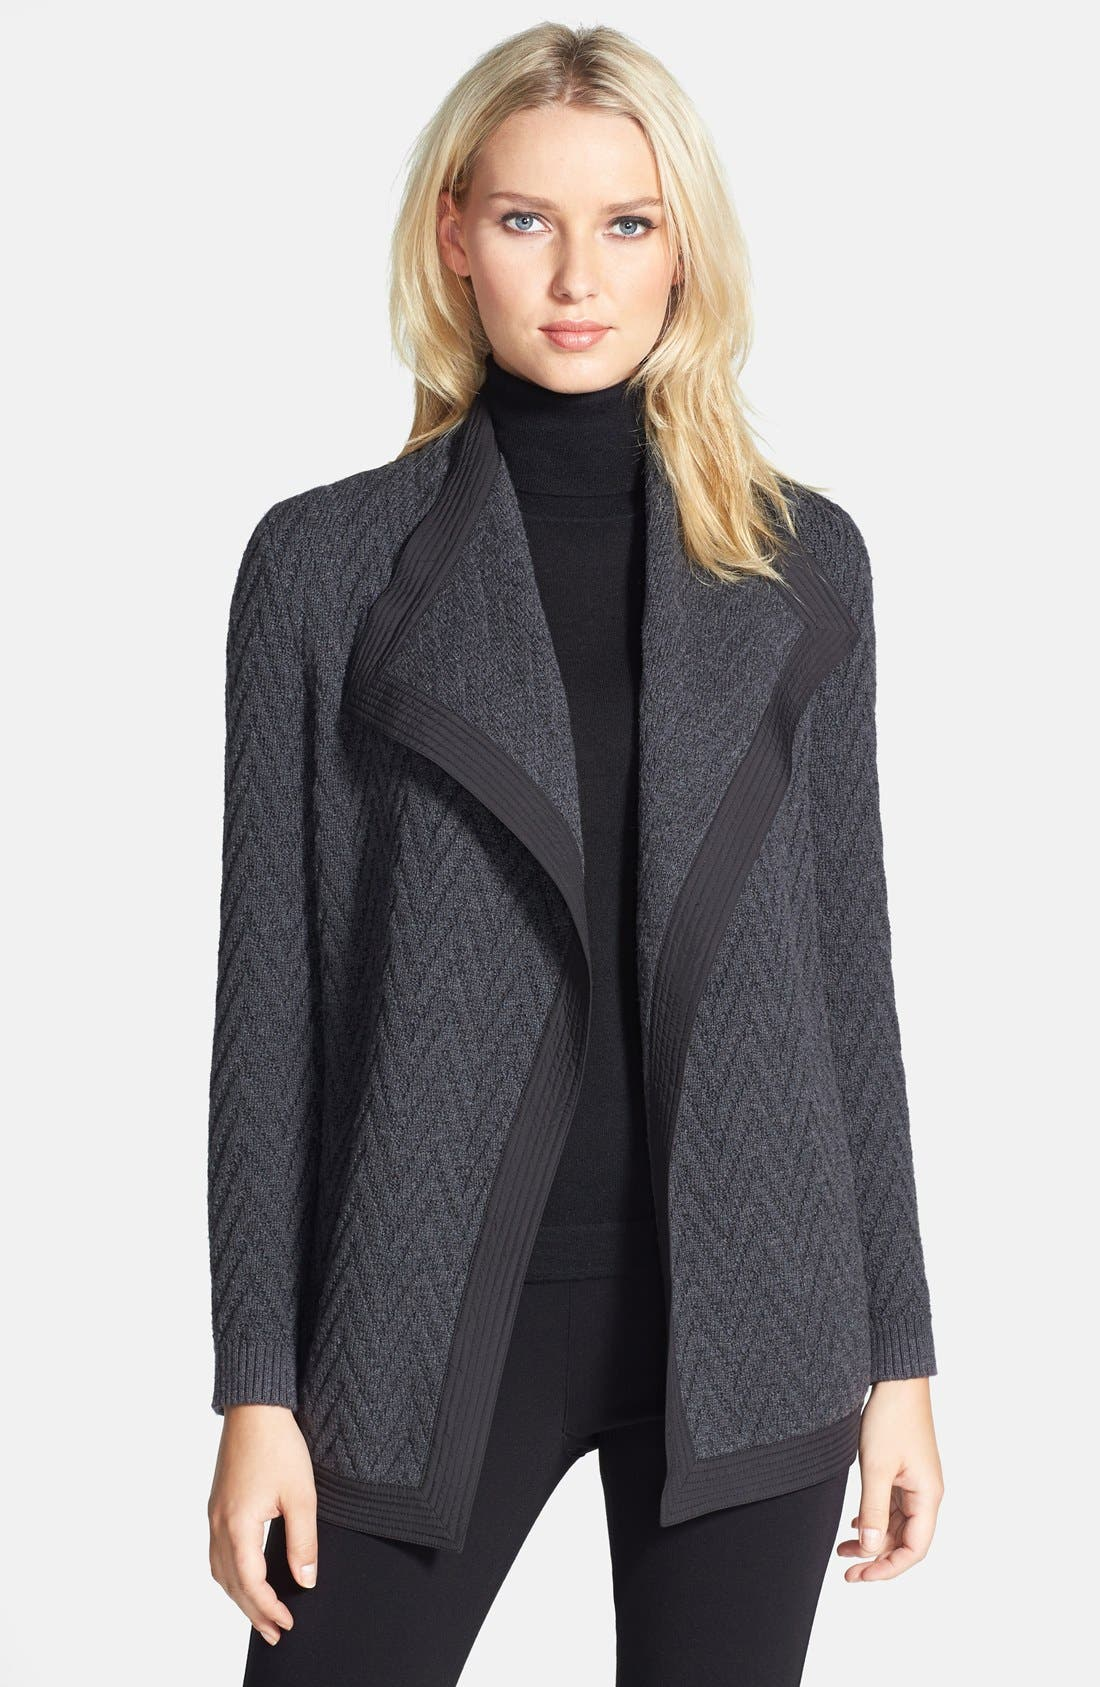 Alternate Image 1 Selected - Lafayette 148 New York Woven Back Zigzag Merino Wool Cardigan (Regular & Petite)